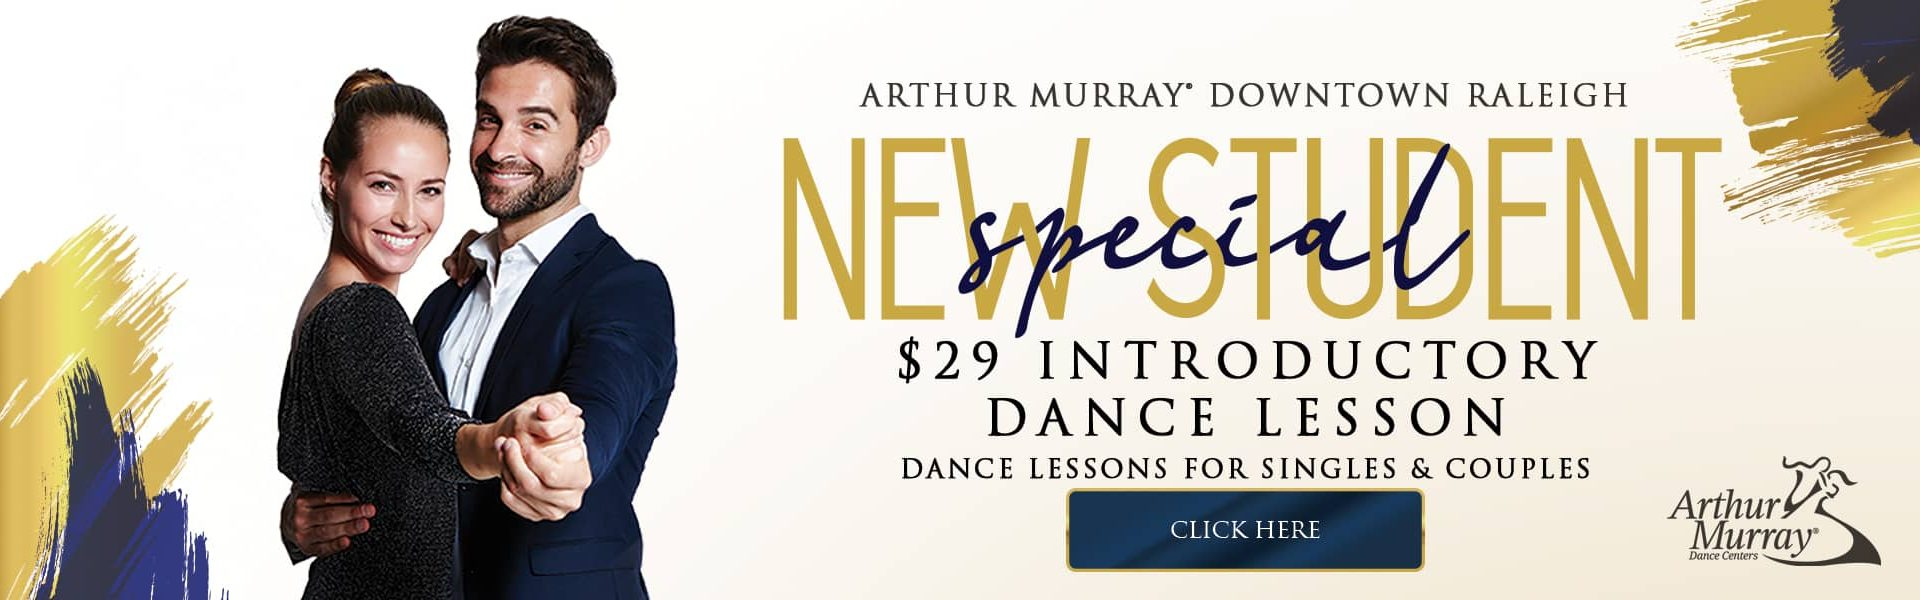 Arthur Murray Downtown Raleigh New Student Offer